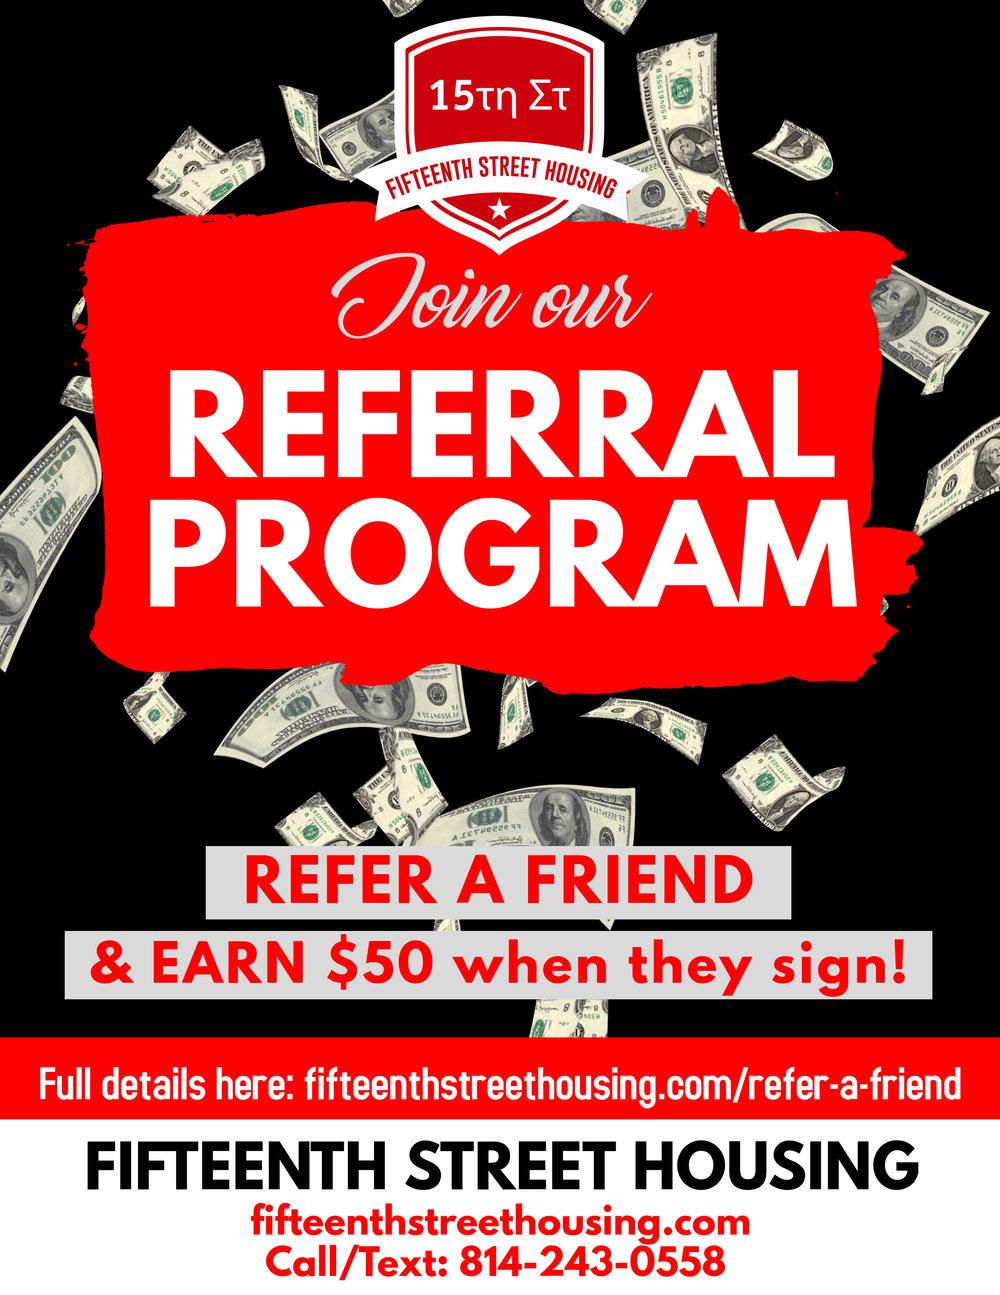 refer a friend new flyer 2-8-19.jpg